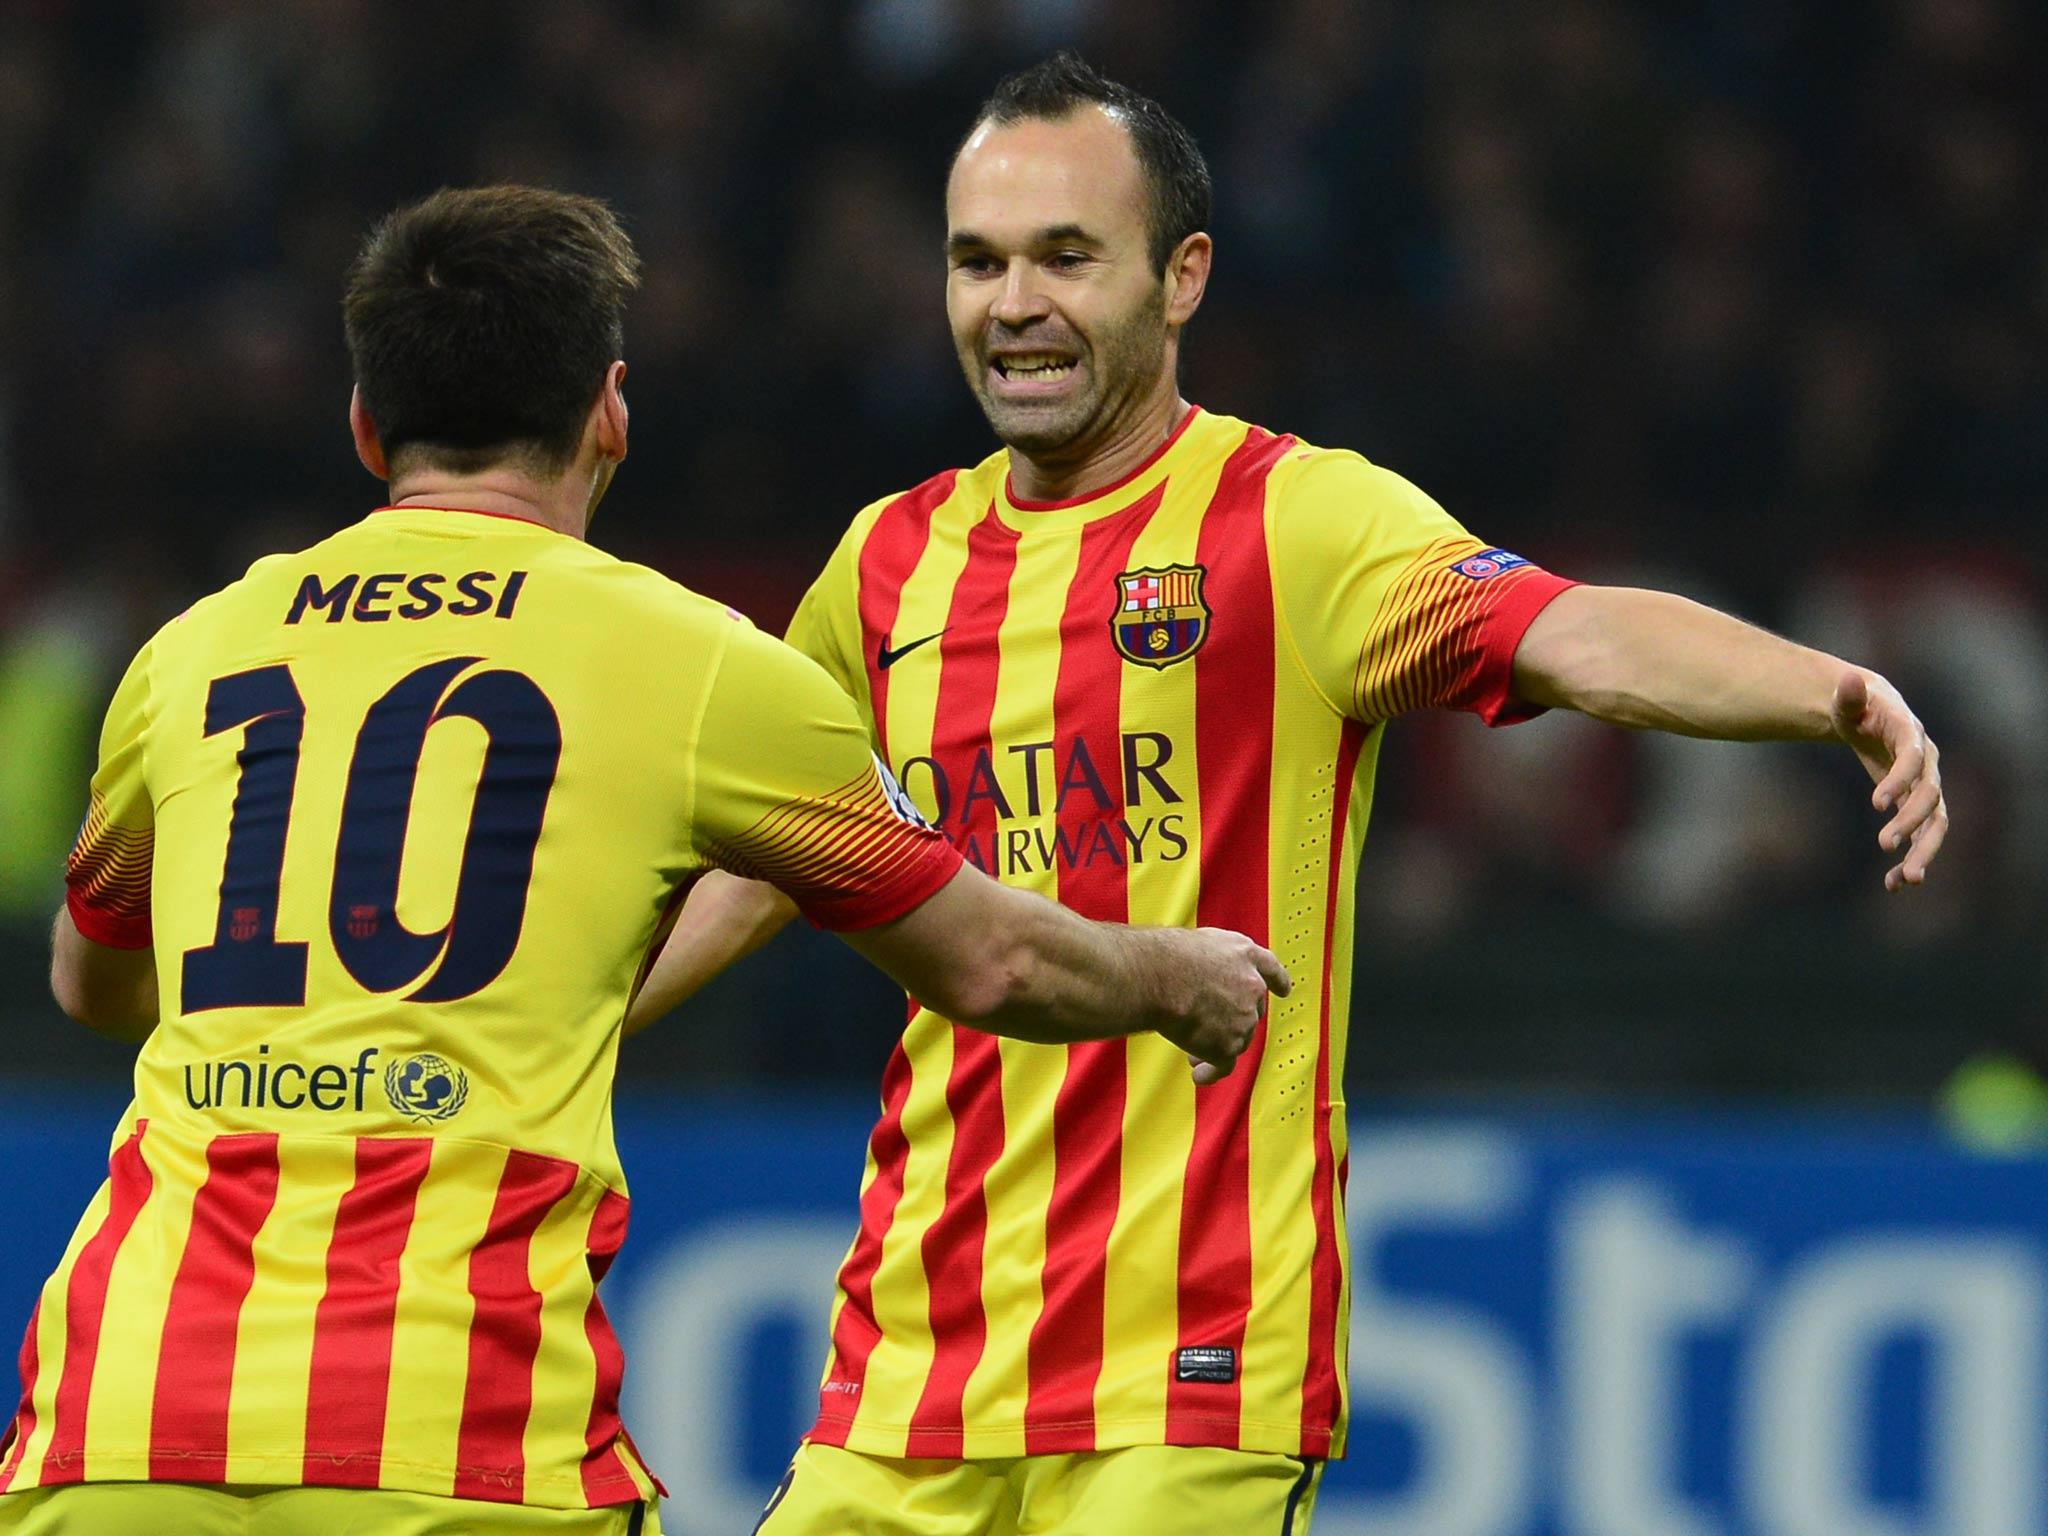 Barcelona midfielder Andres Iniesta signs three year contract